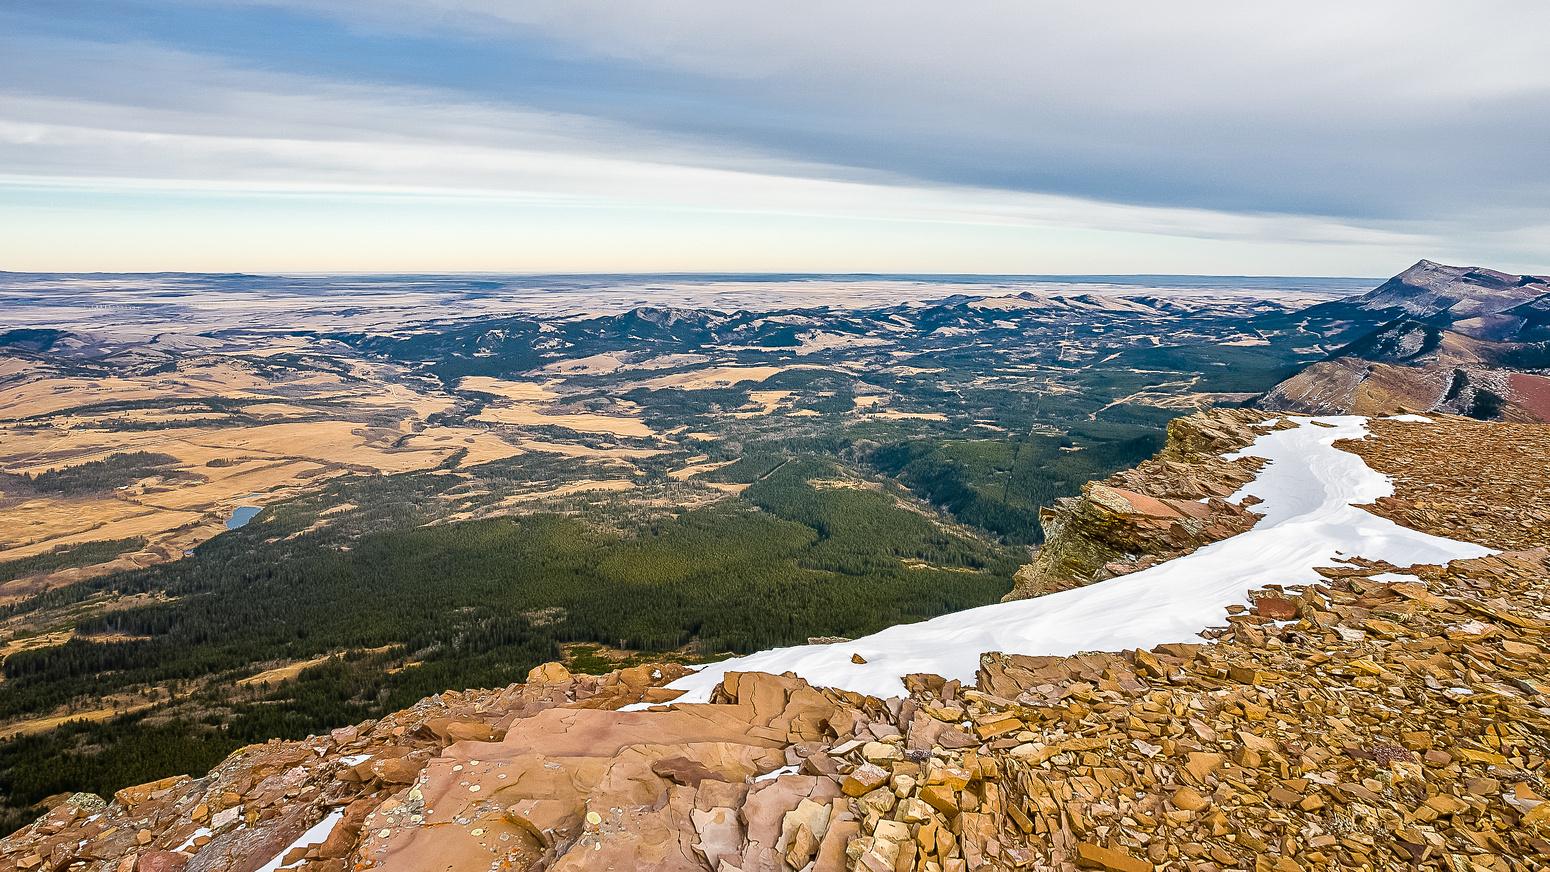 Great view off the summit ridge towards the prairies.